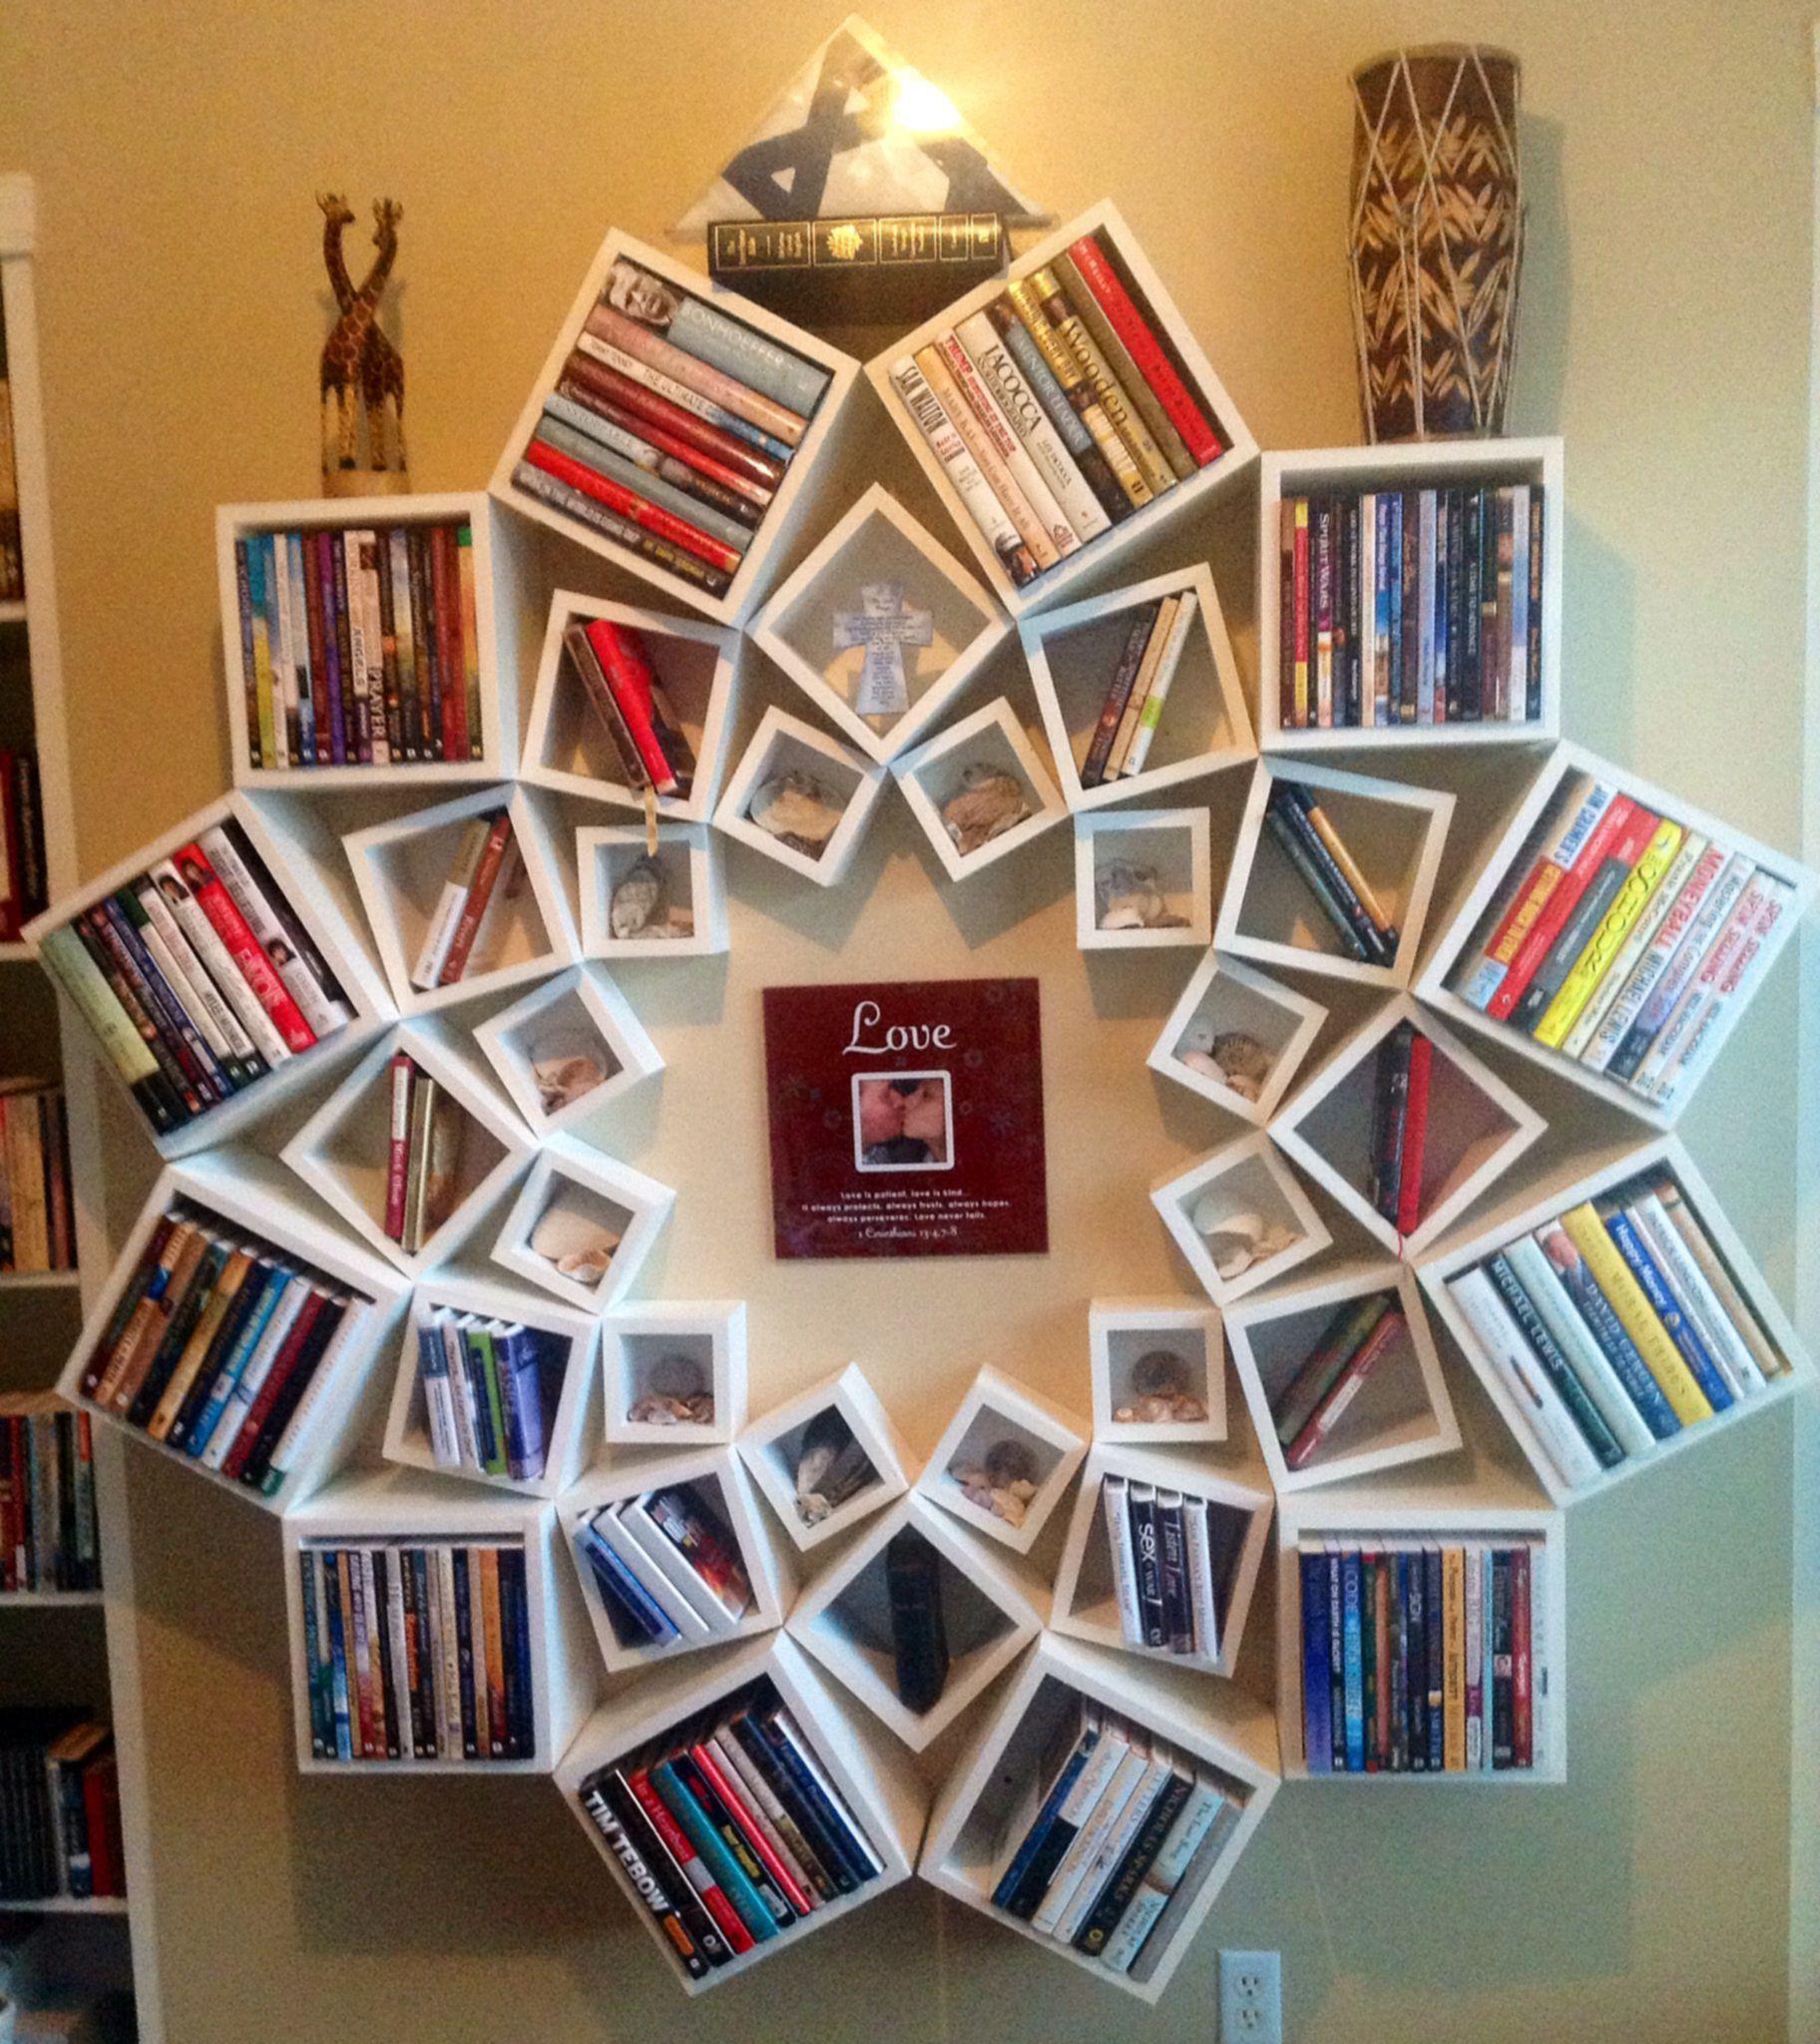 Do It Yourself Bookshelf Ideas: 20 Wonderful And Creative Bookshelves Design Anyone Can Do